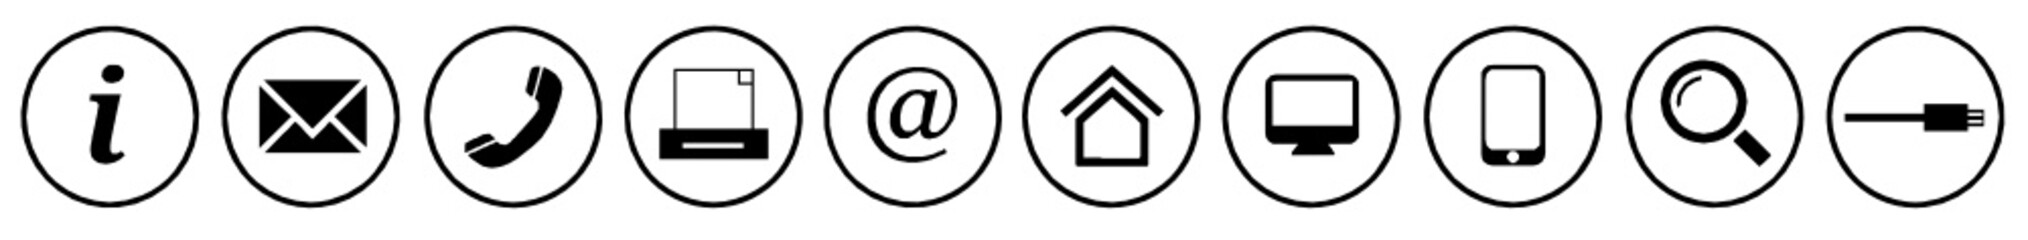 kontakt icons symbol buttons schwarz